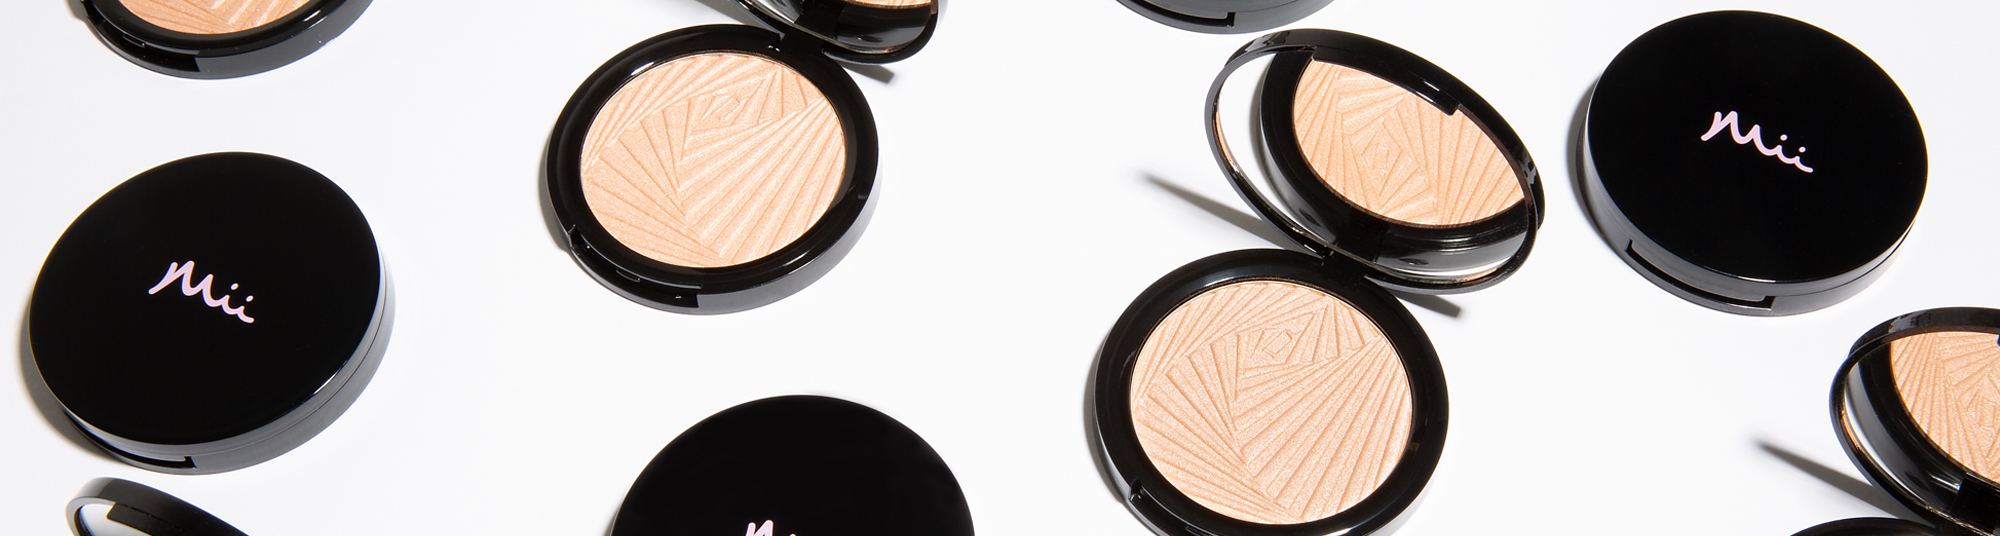 Mii Cosmetics Highlighter & Contouring category